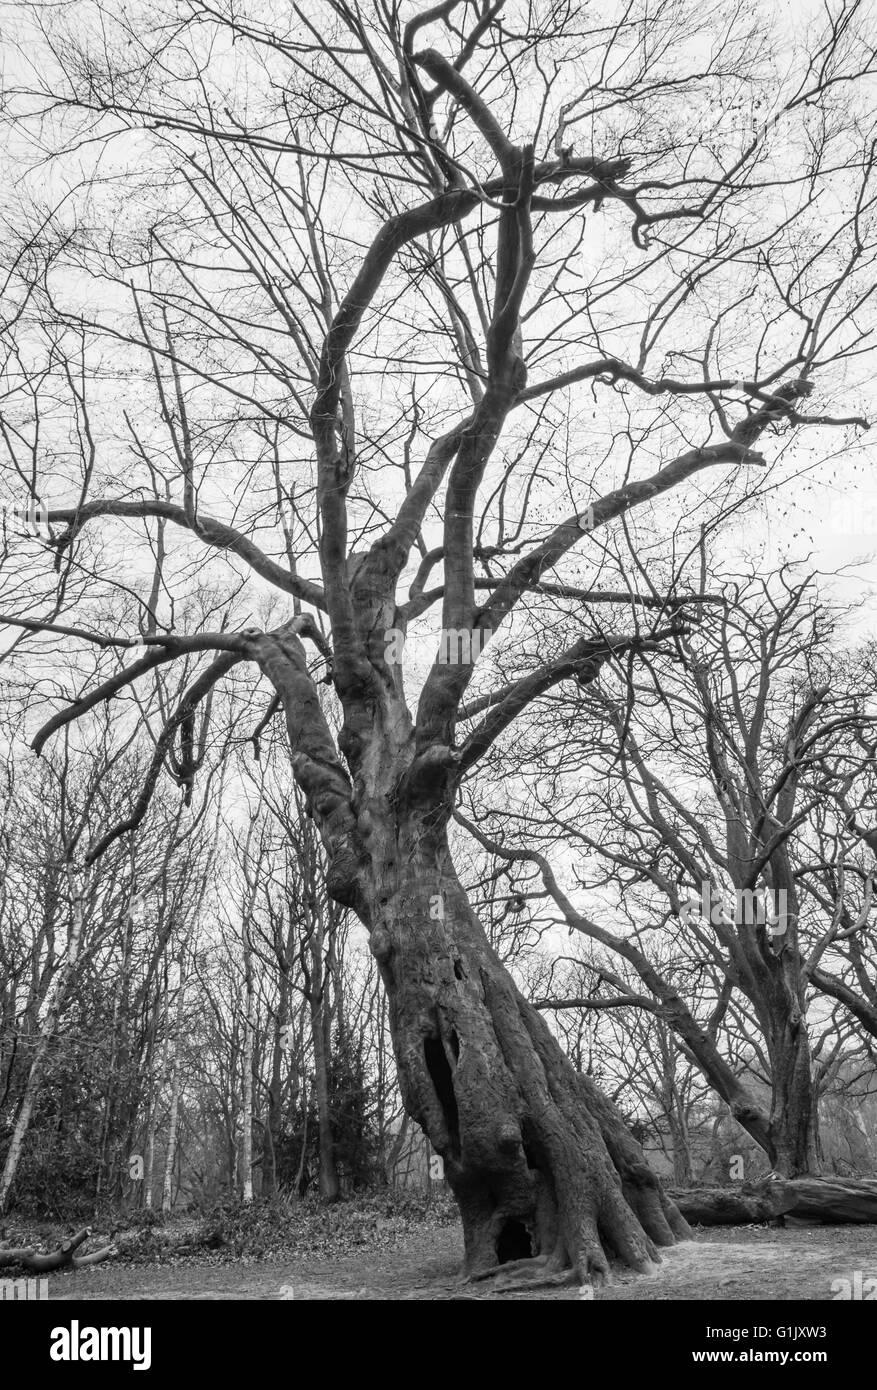 Black and white image of a bare tree on Hampstead Heath, London, UK. - Stock Image